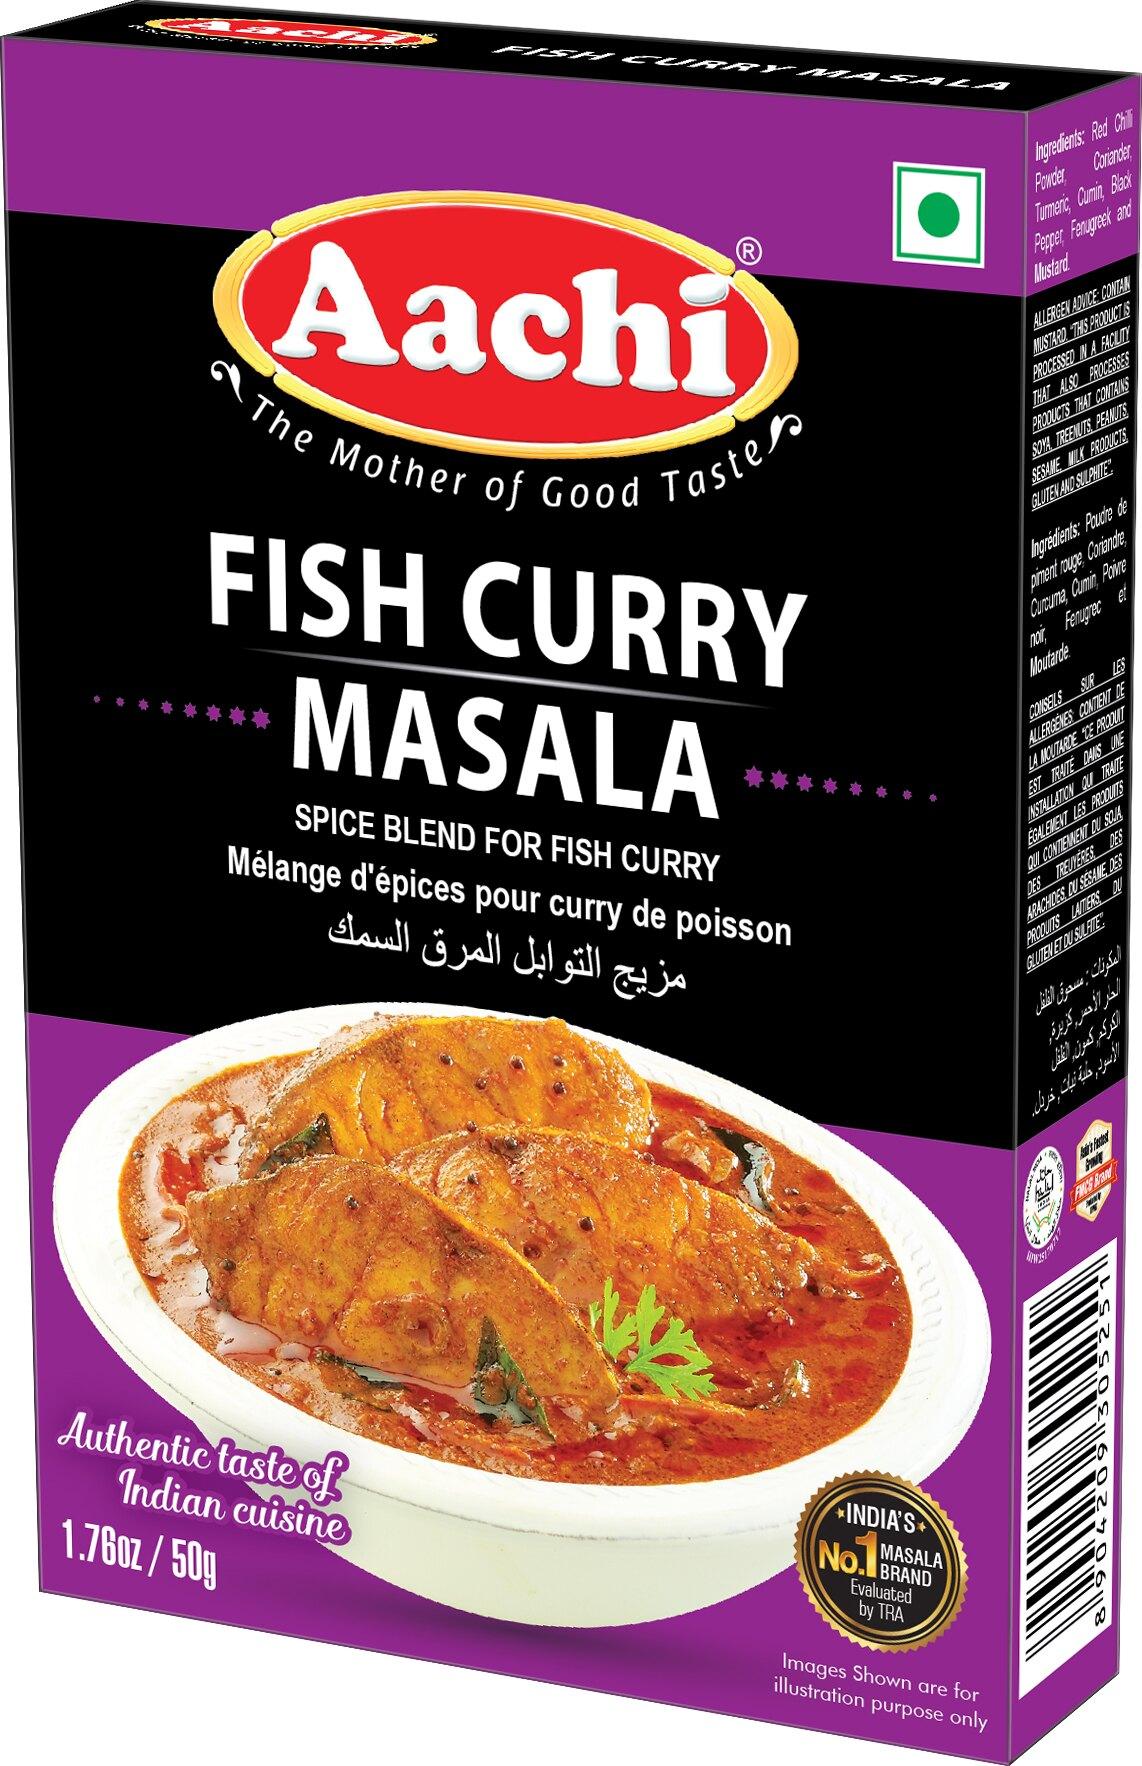 魚 / 海鮮咖哩粉 Fish Curry Masala AACHI 50gm